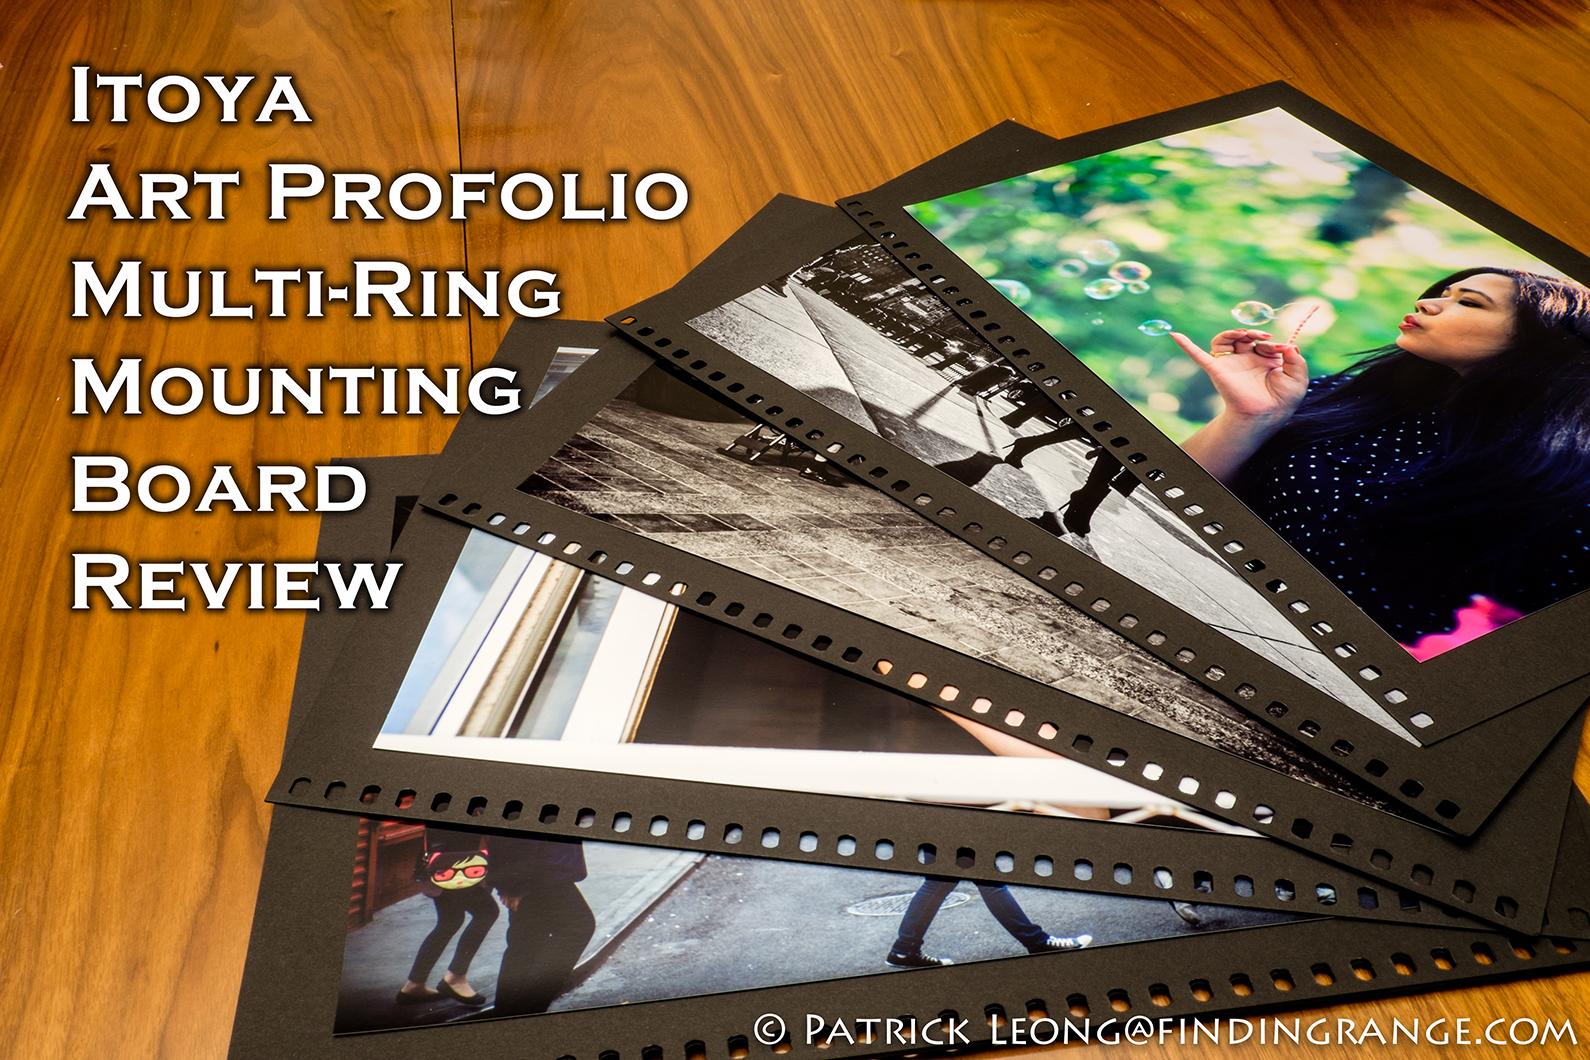 Itoya-Art-Profolio-Multi-Ring-Mounting-Board-Review-1